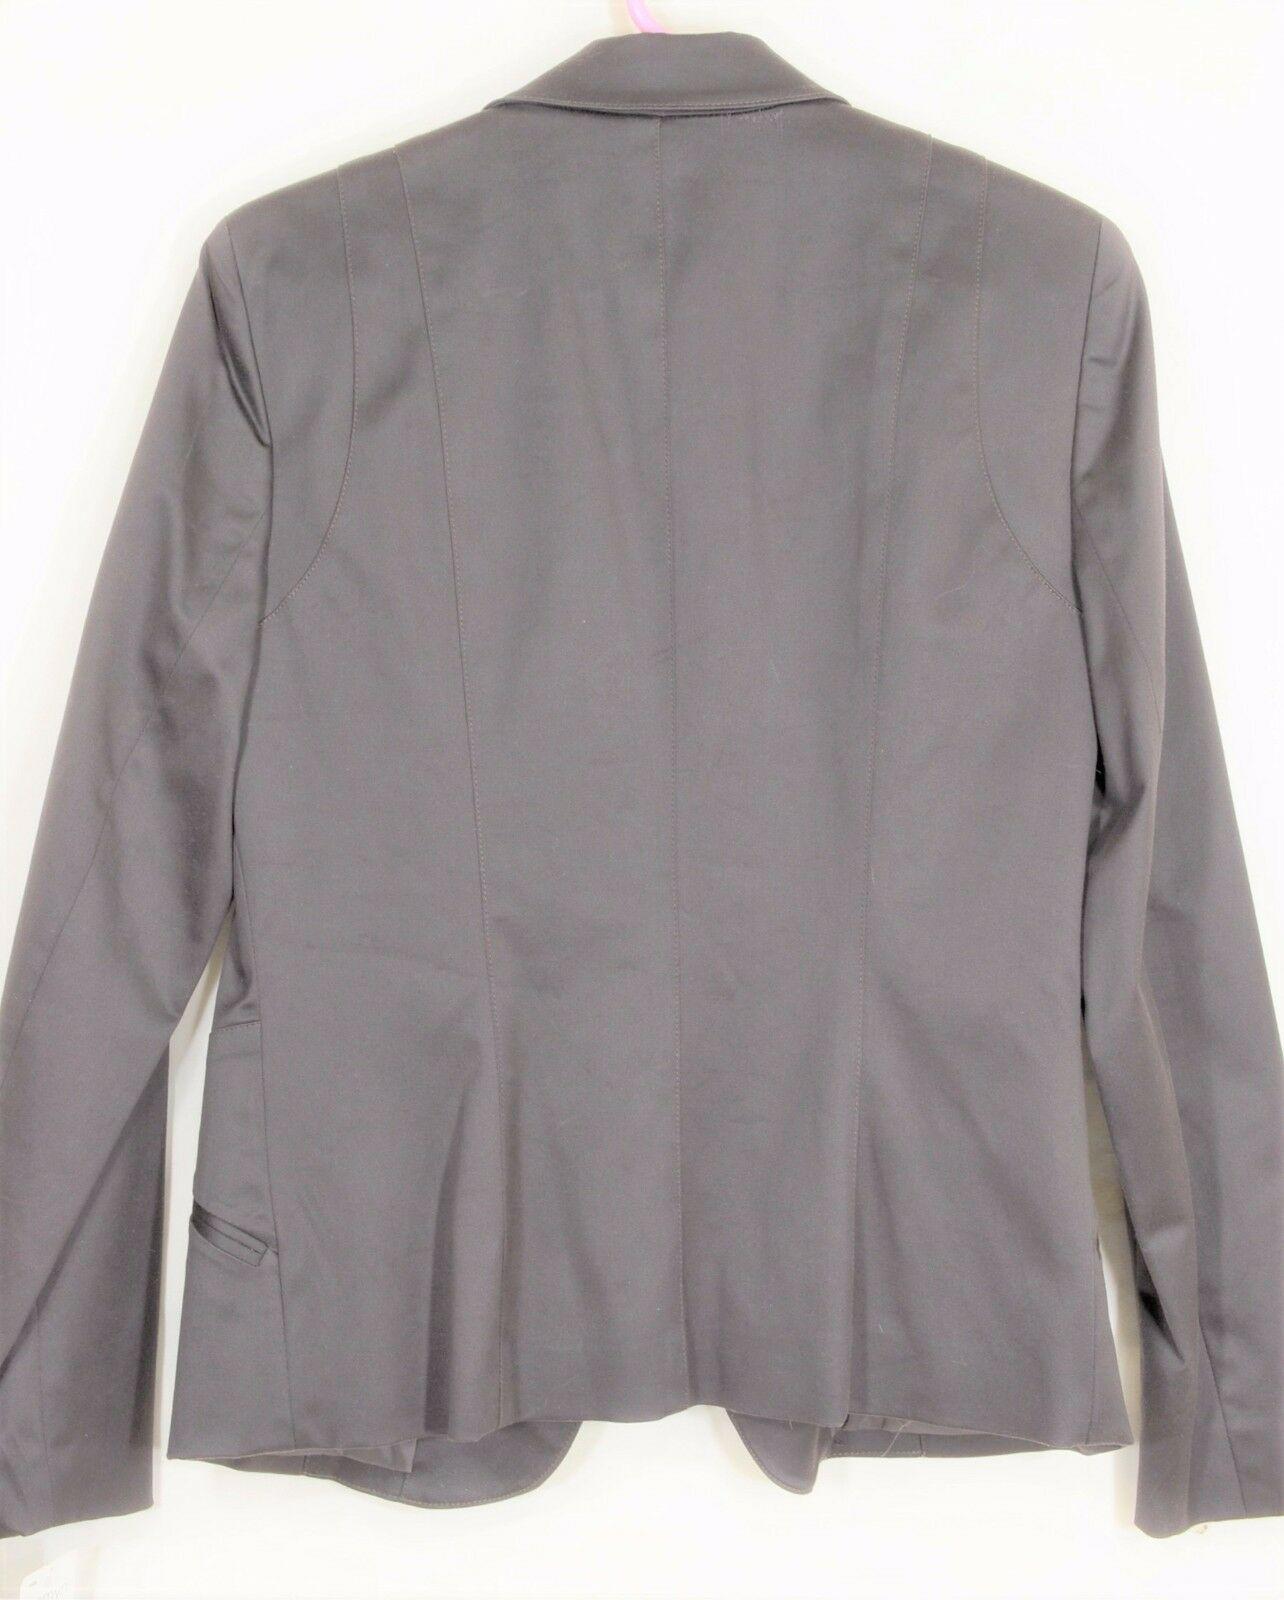 womyn jacket coat NWT SZ 8 dark brown 1-button closure lined NYC USA new image 11